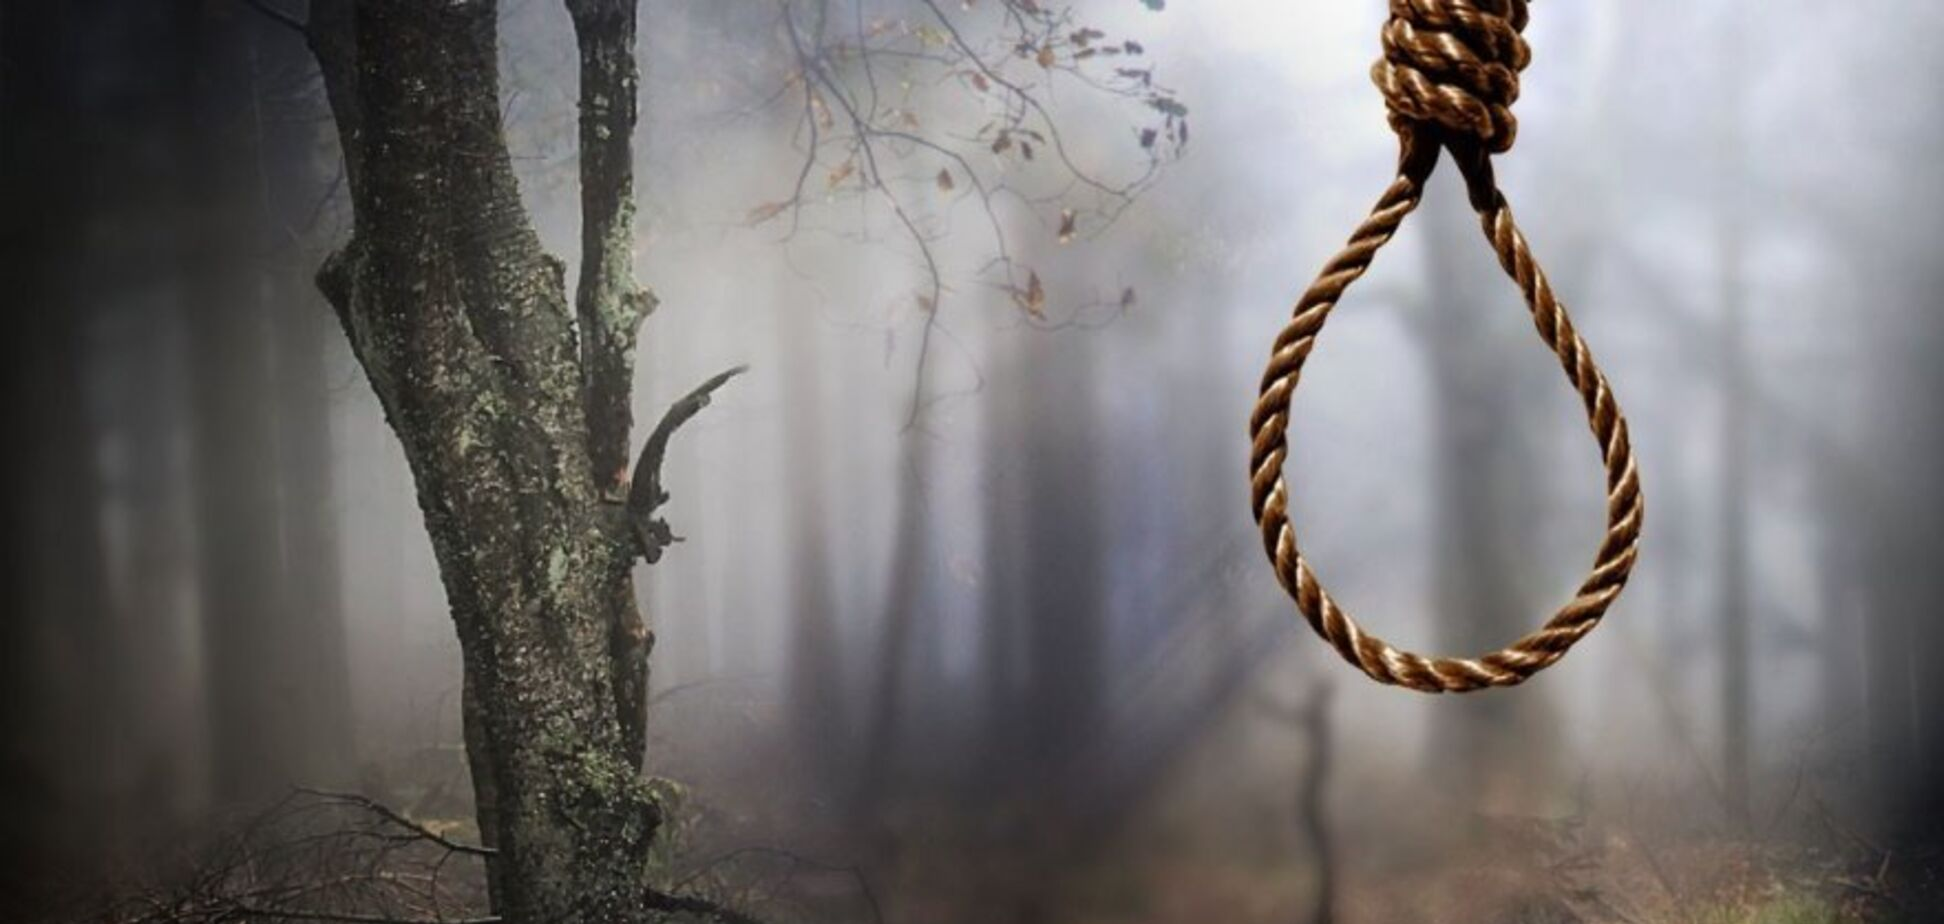 Висел на дереве: в Кривом Роге на улице нашли труп мужчины